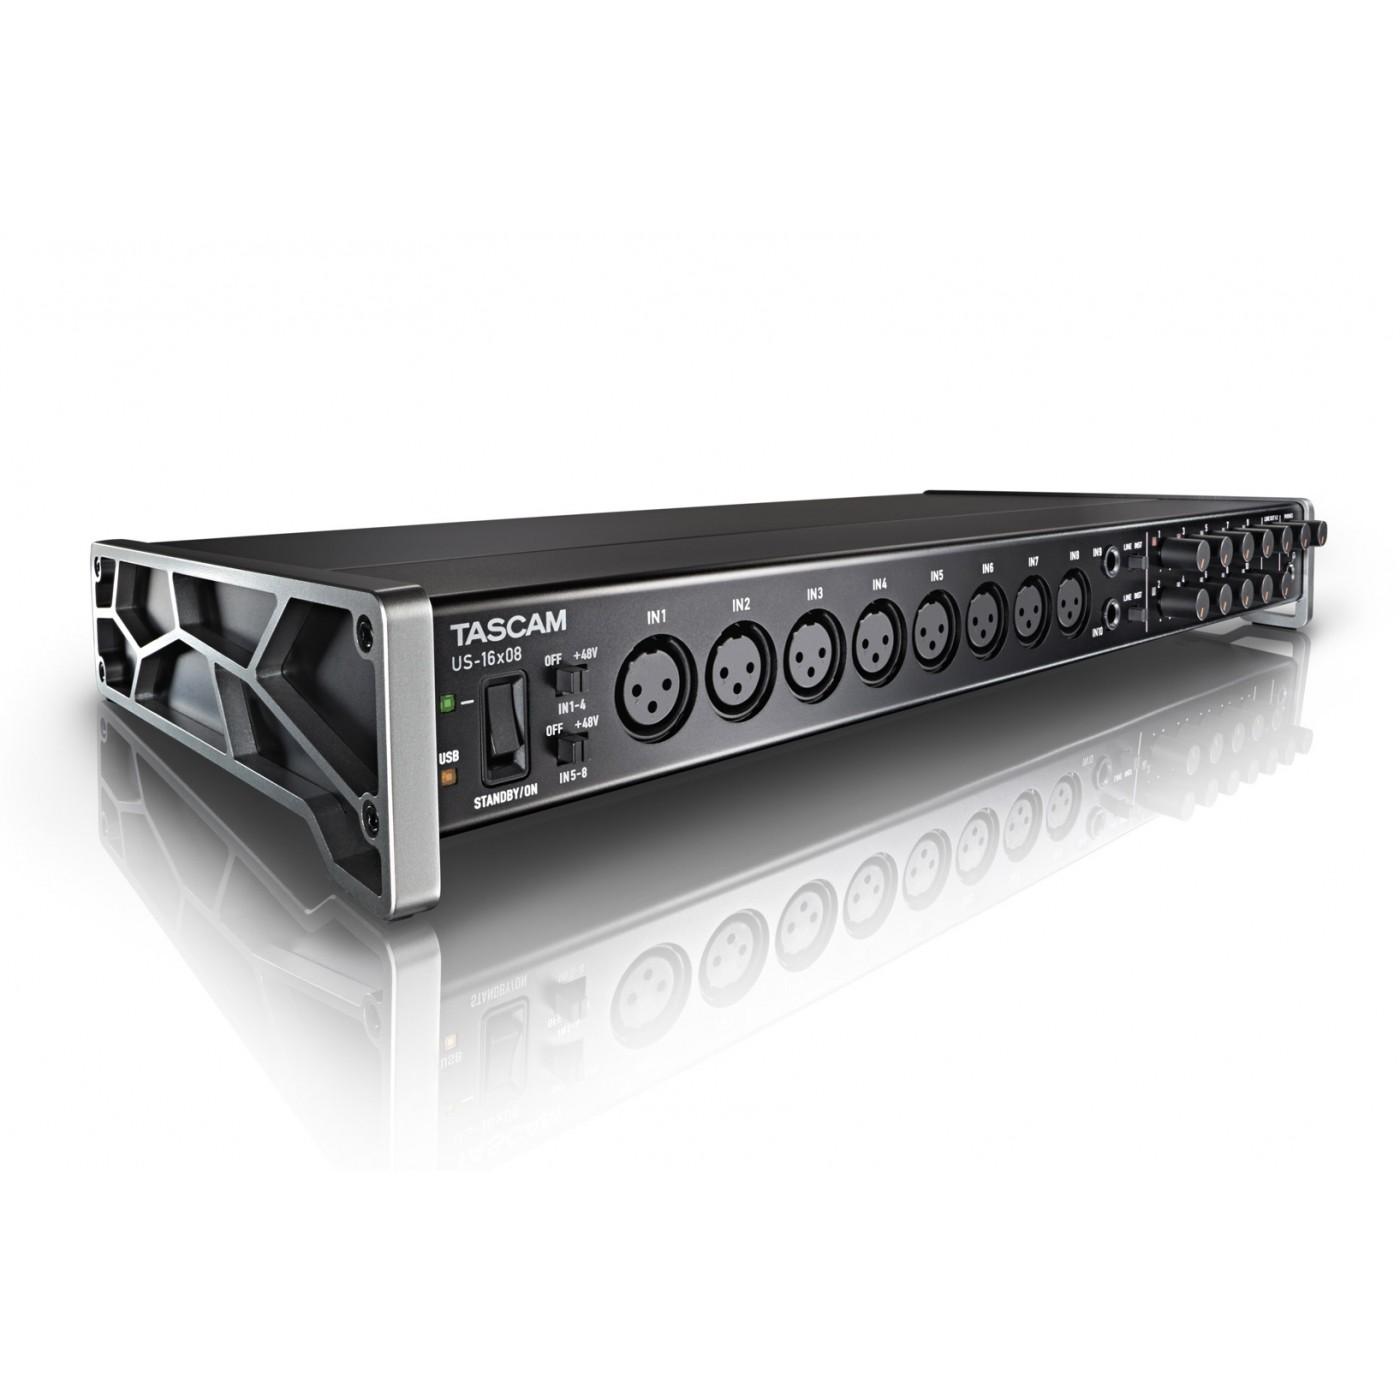 Tascam US-16x08 | Rage Audio